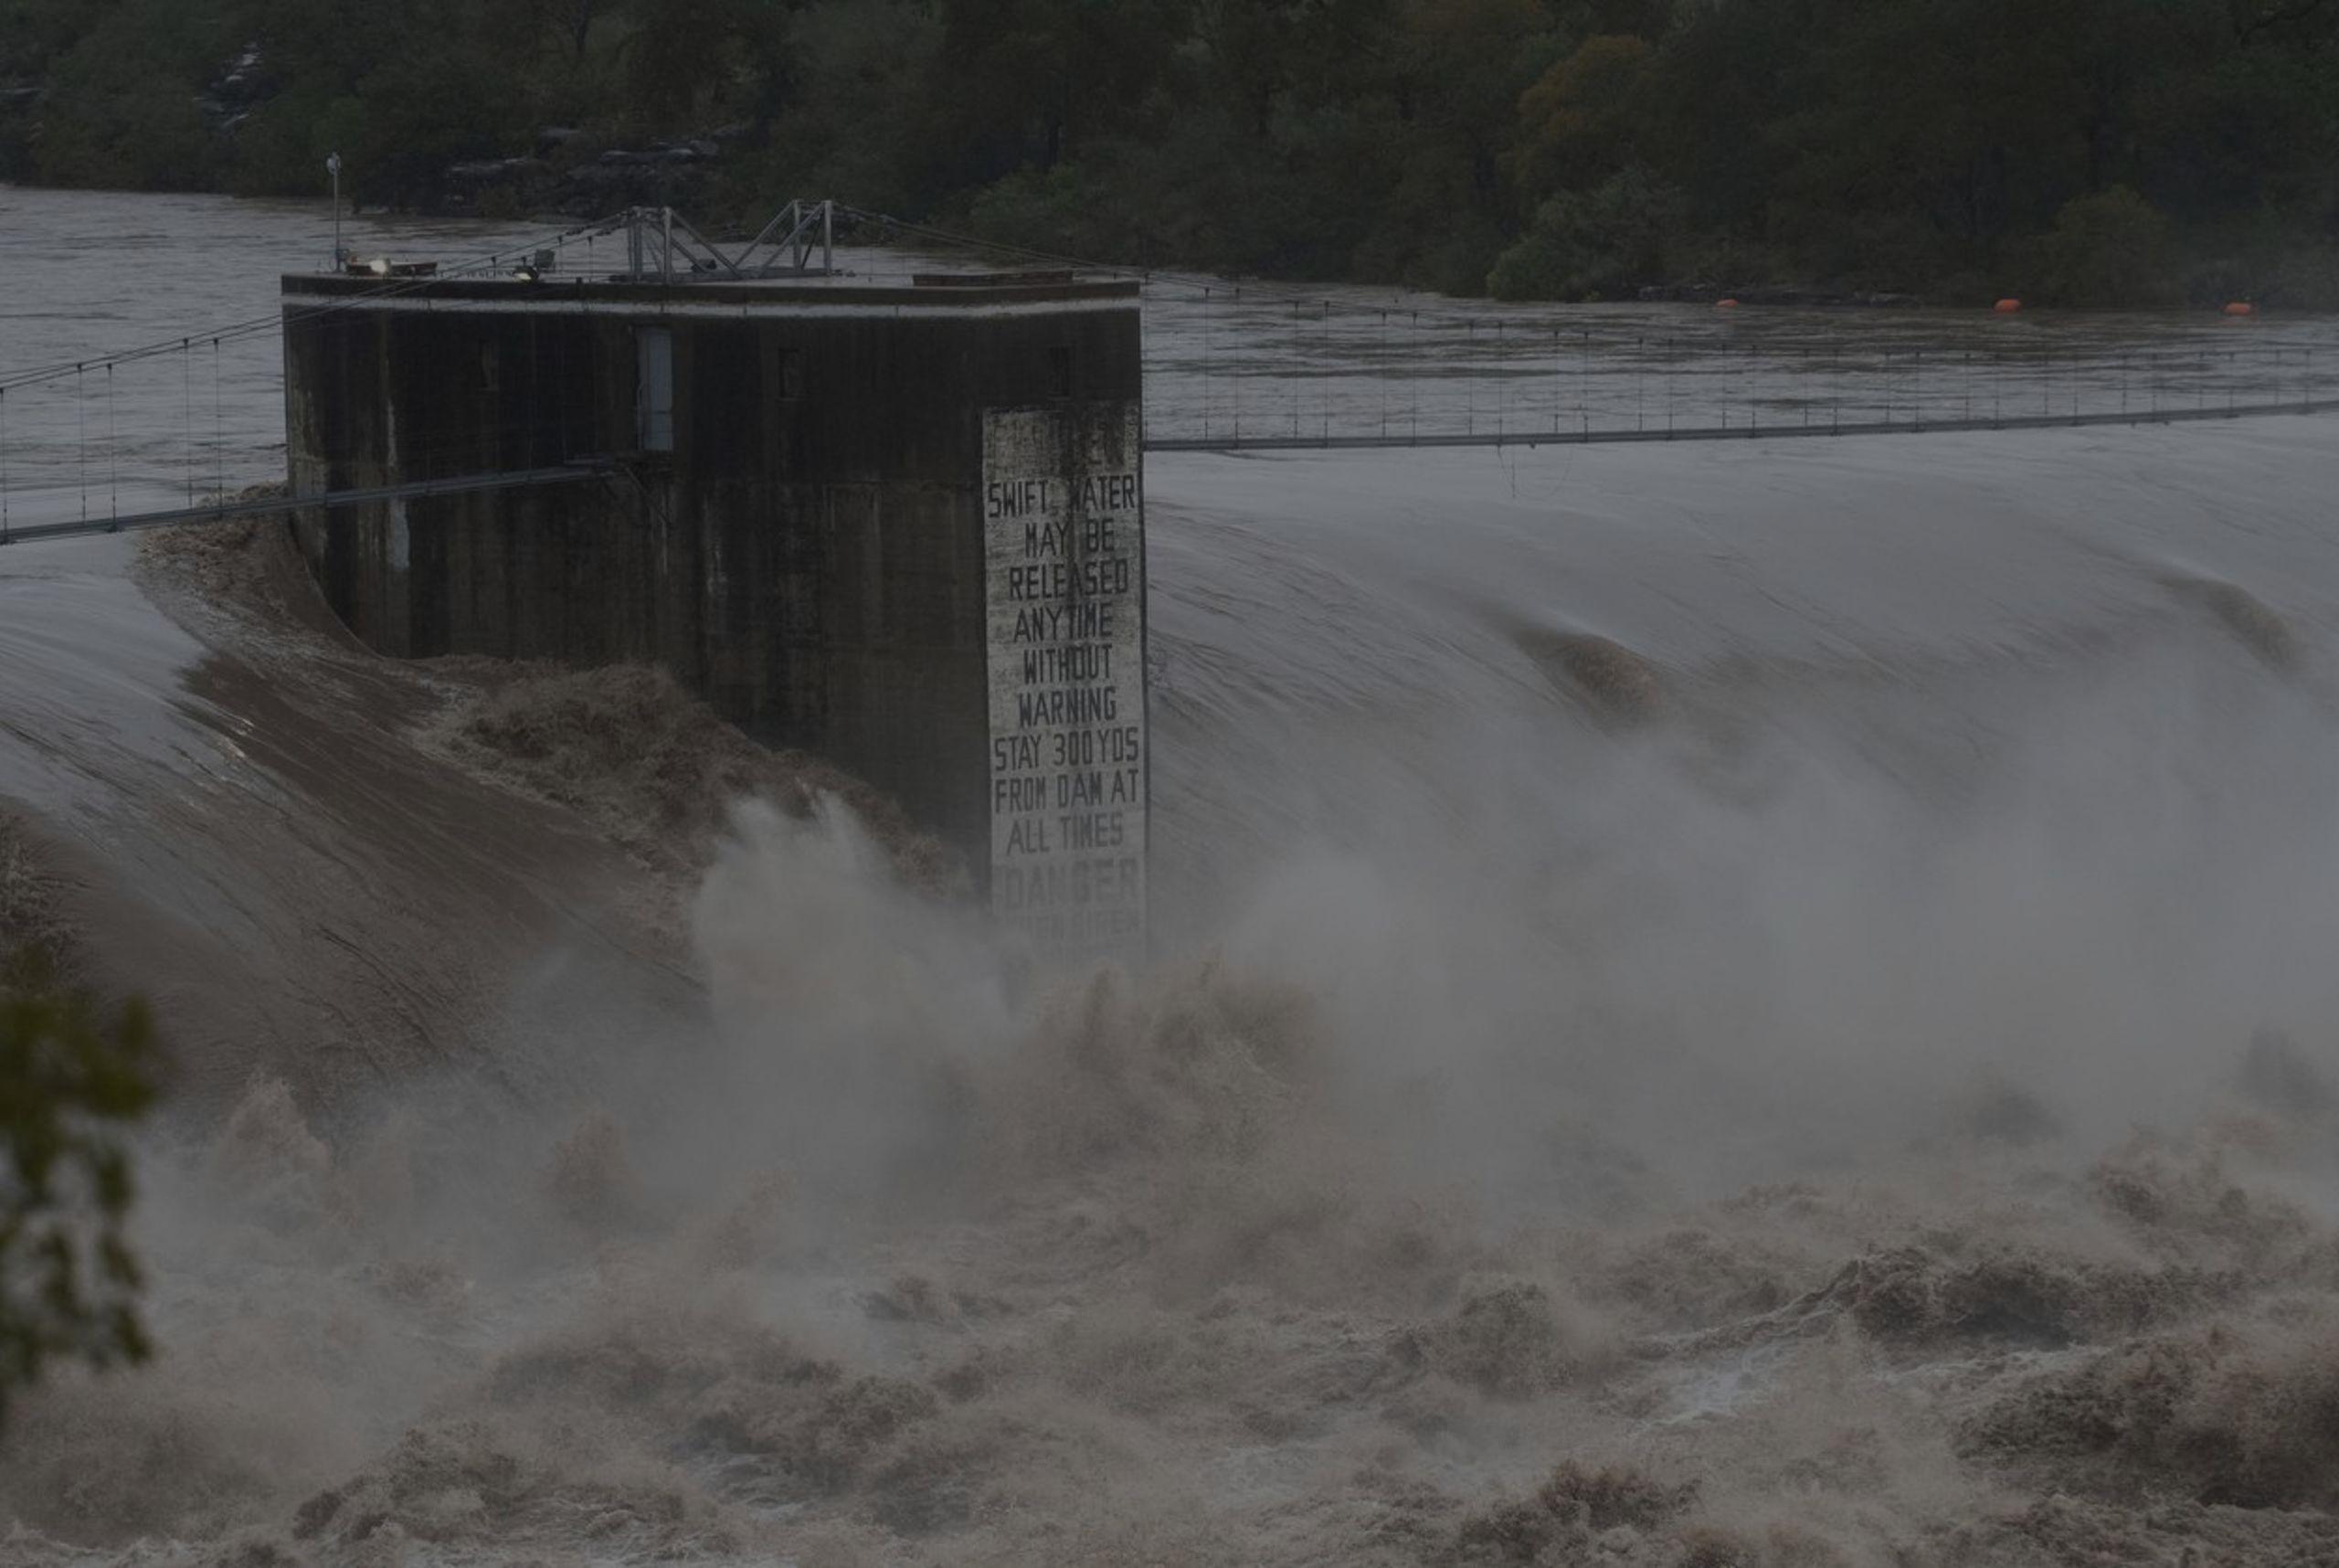 Austin City-Wide Boil Water Notice